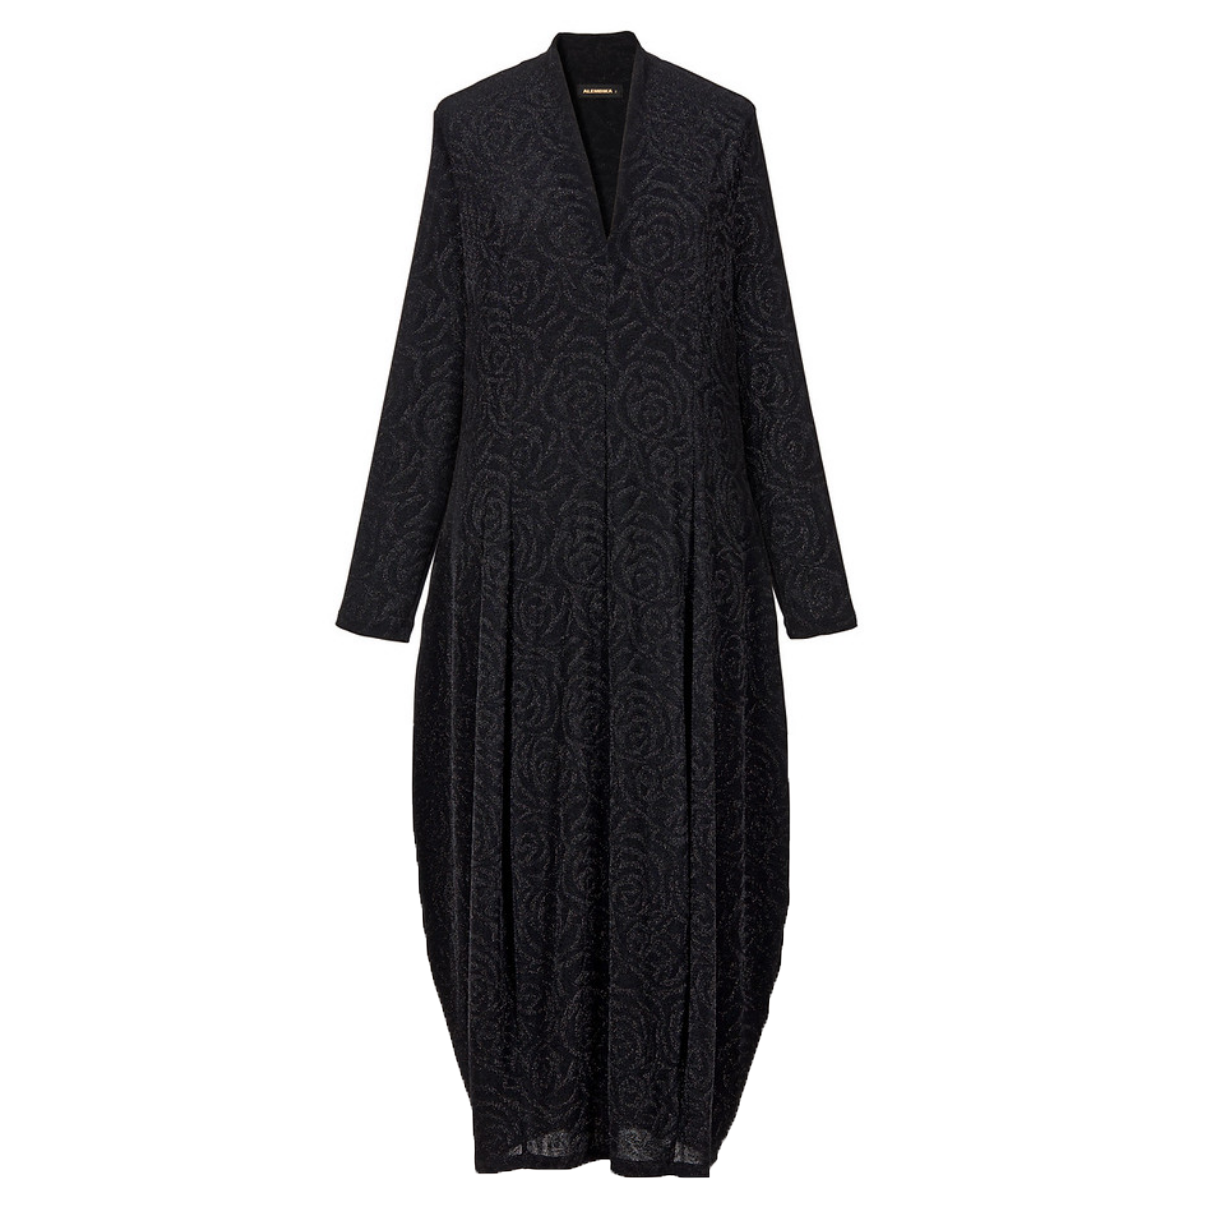 Alembika Alembika Dark Shimmer Dress - Black